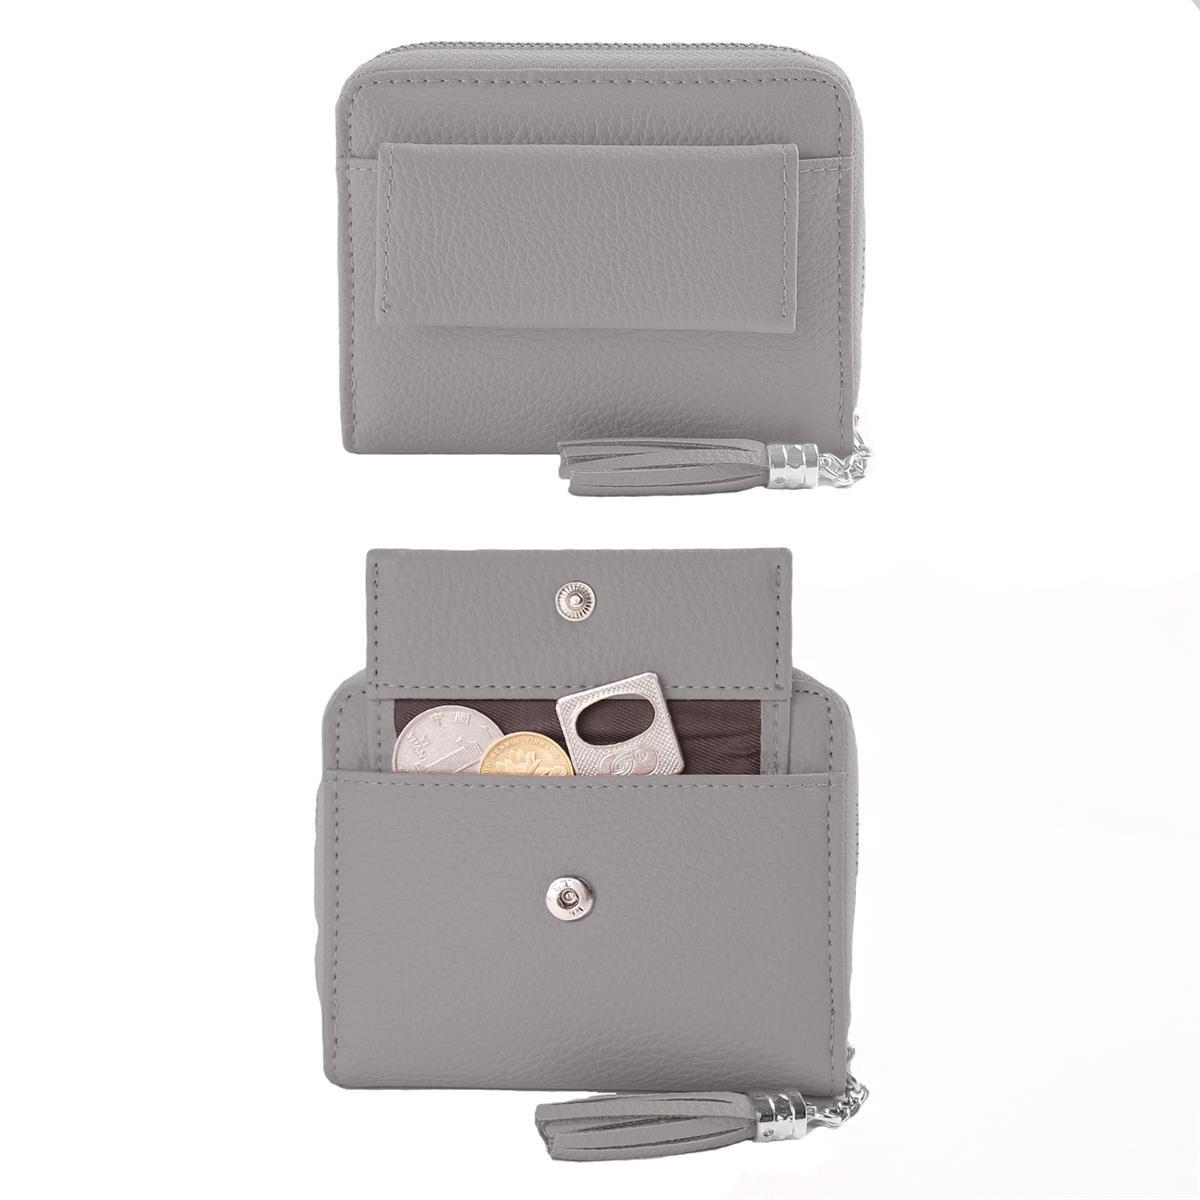 87465e4f1dfa Women Small Wallet Lady Mini Purse Bifold Leather Short Wallet RFID  Blocking with ID Window